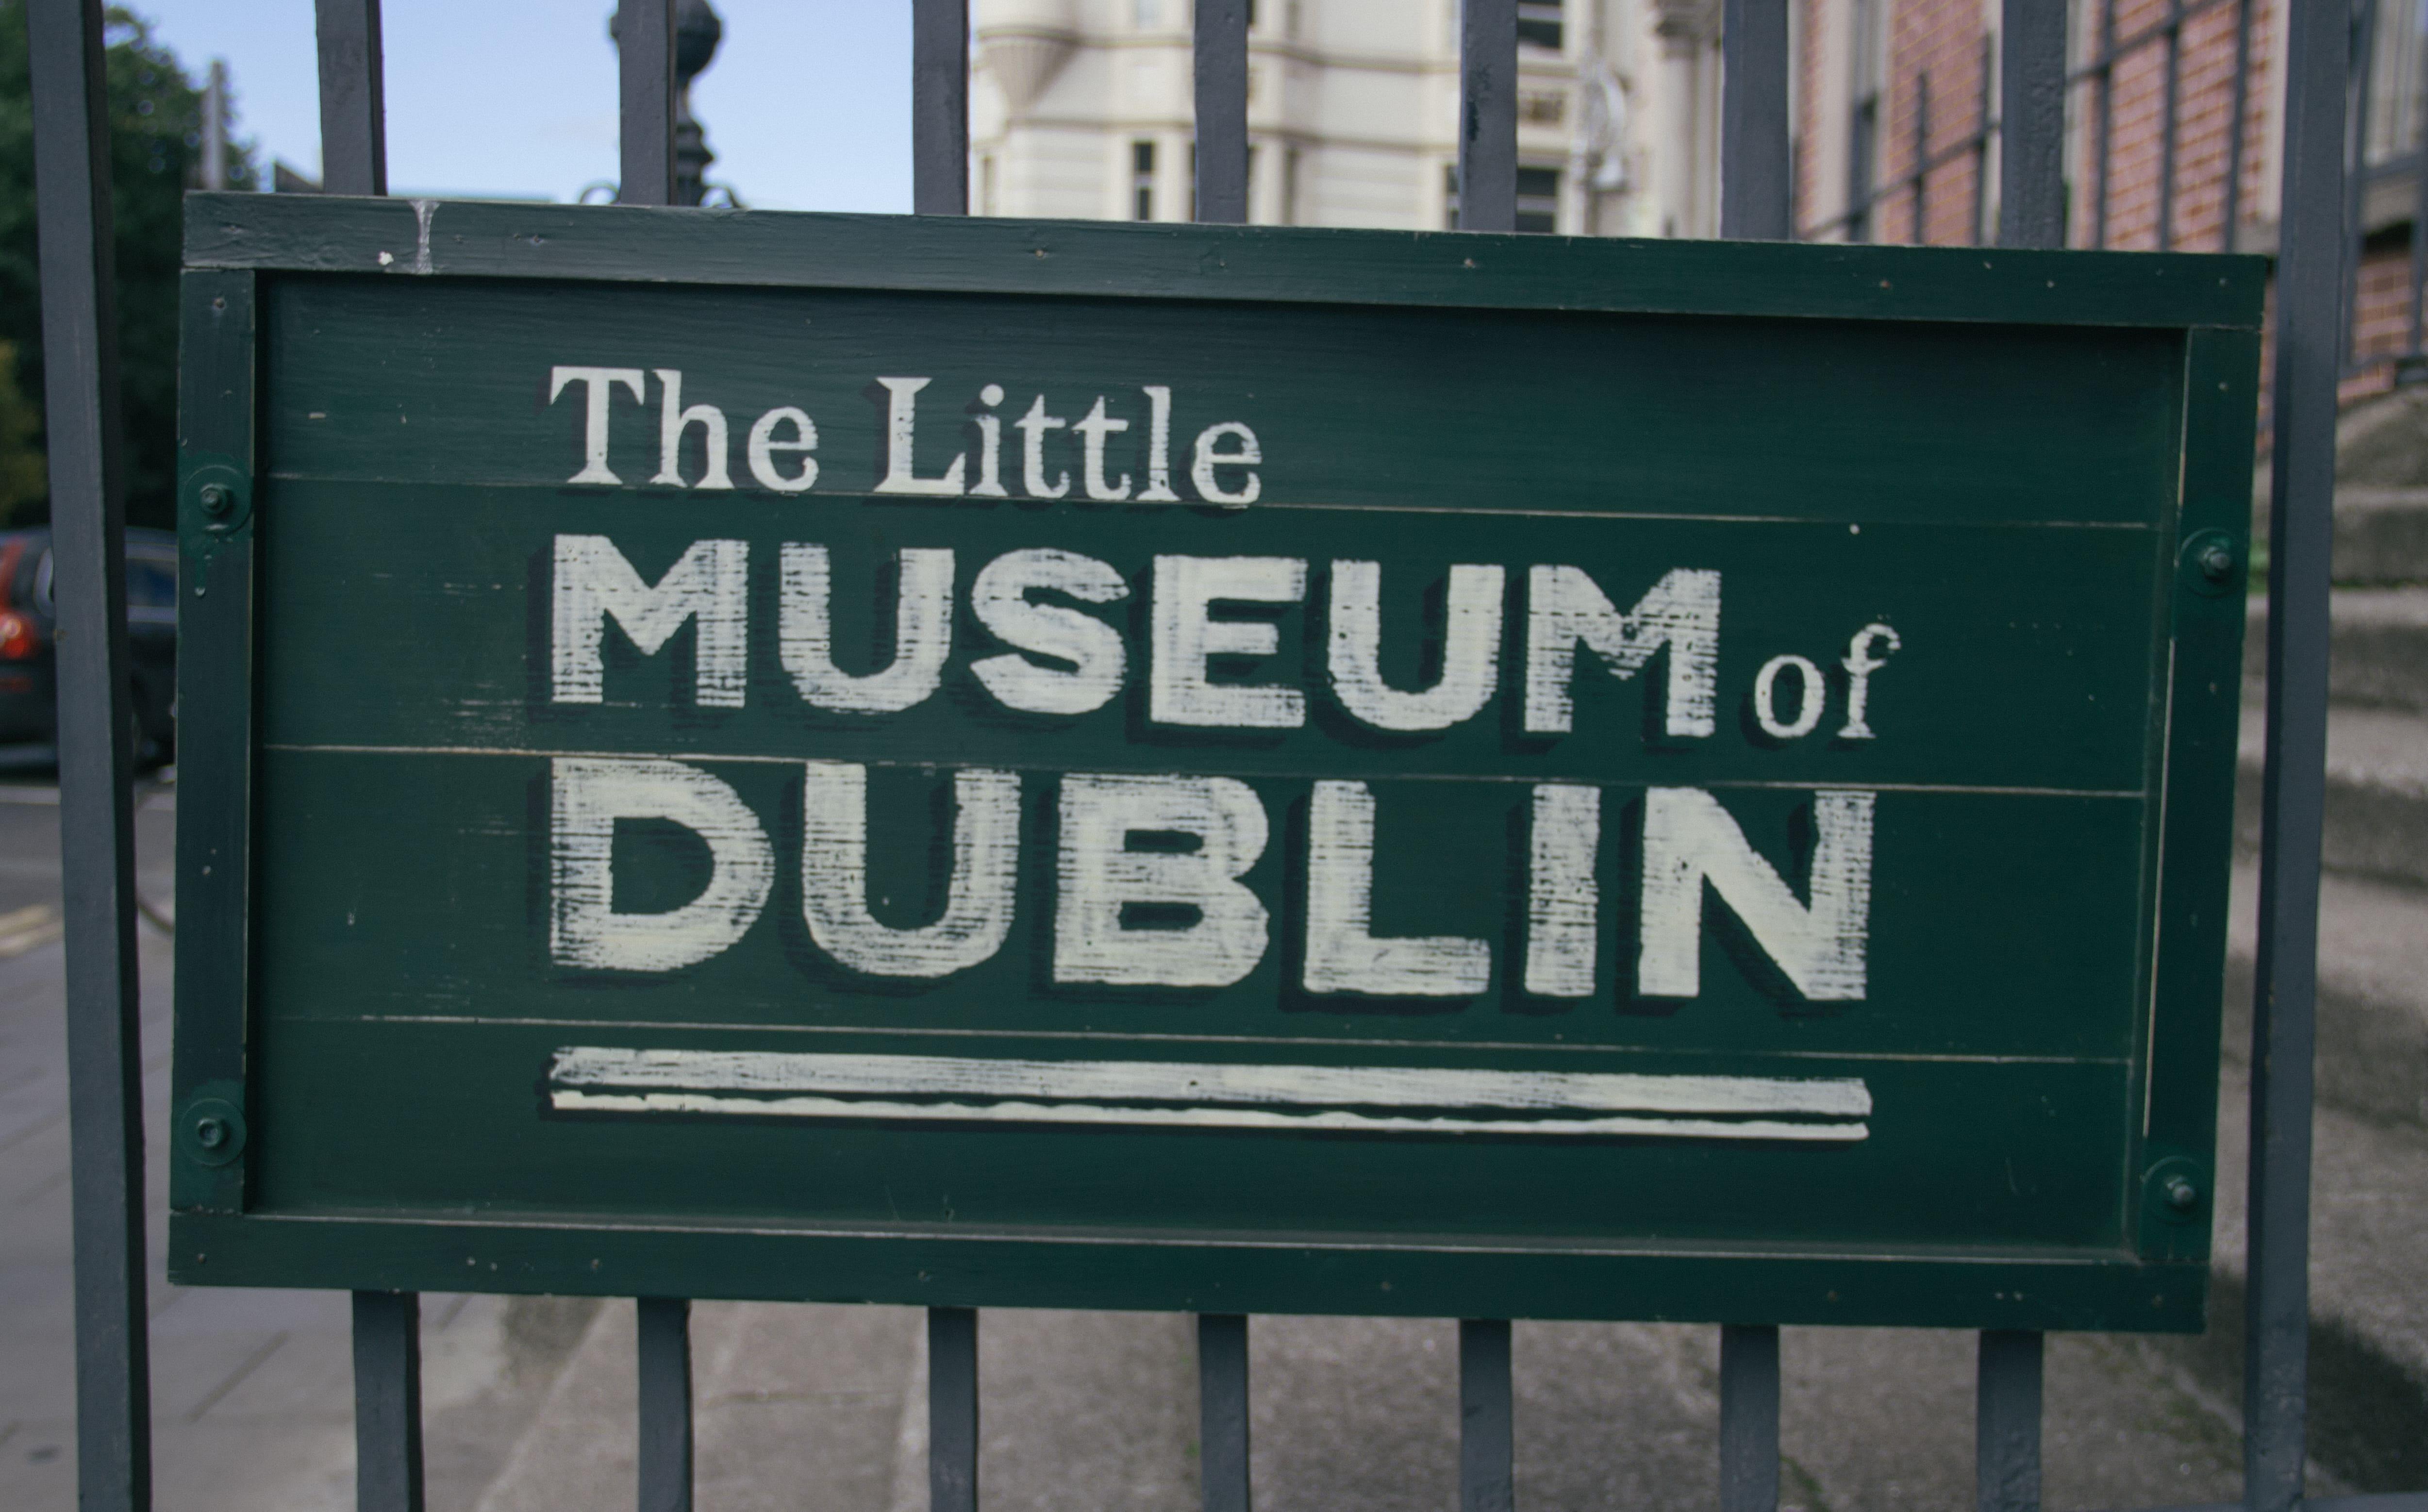 The Little Museum of Dublin, Ireland